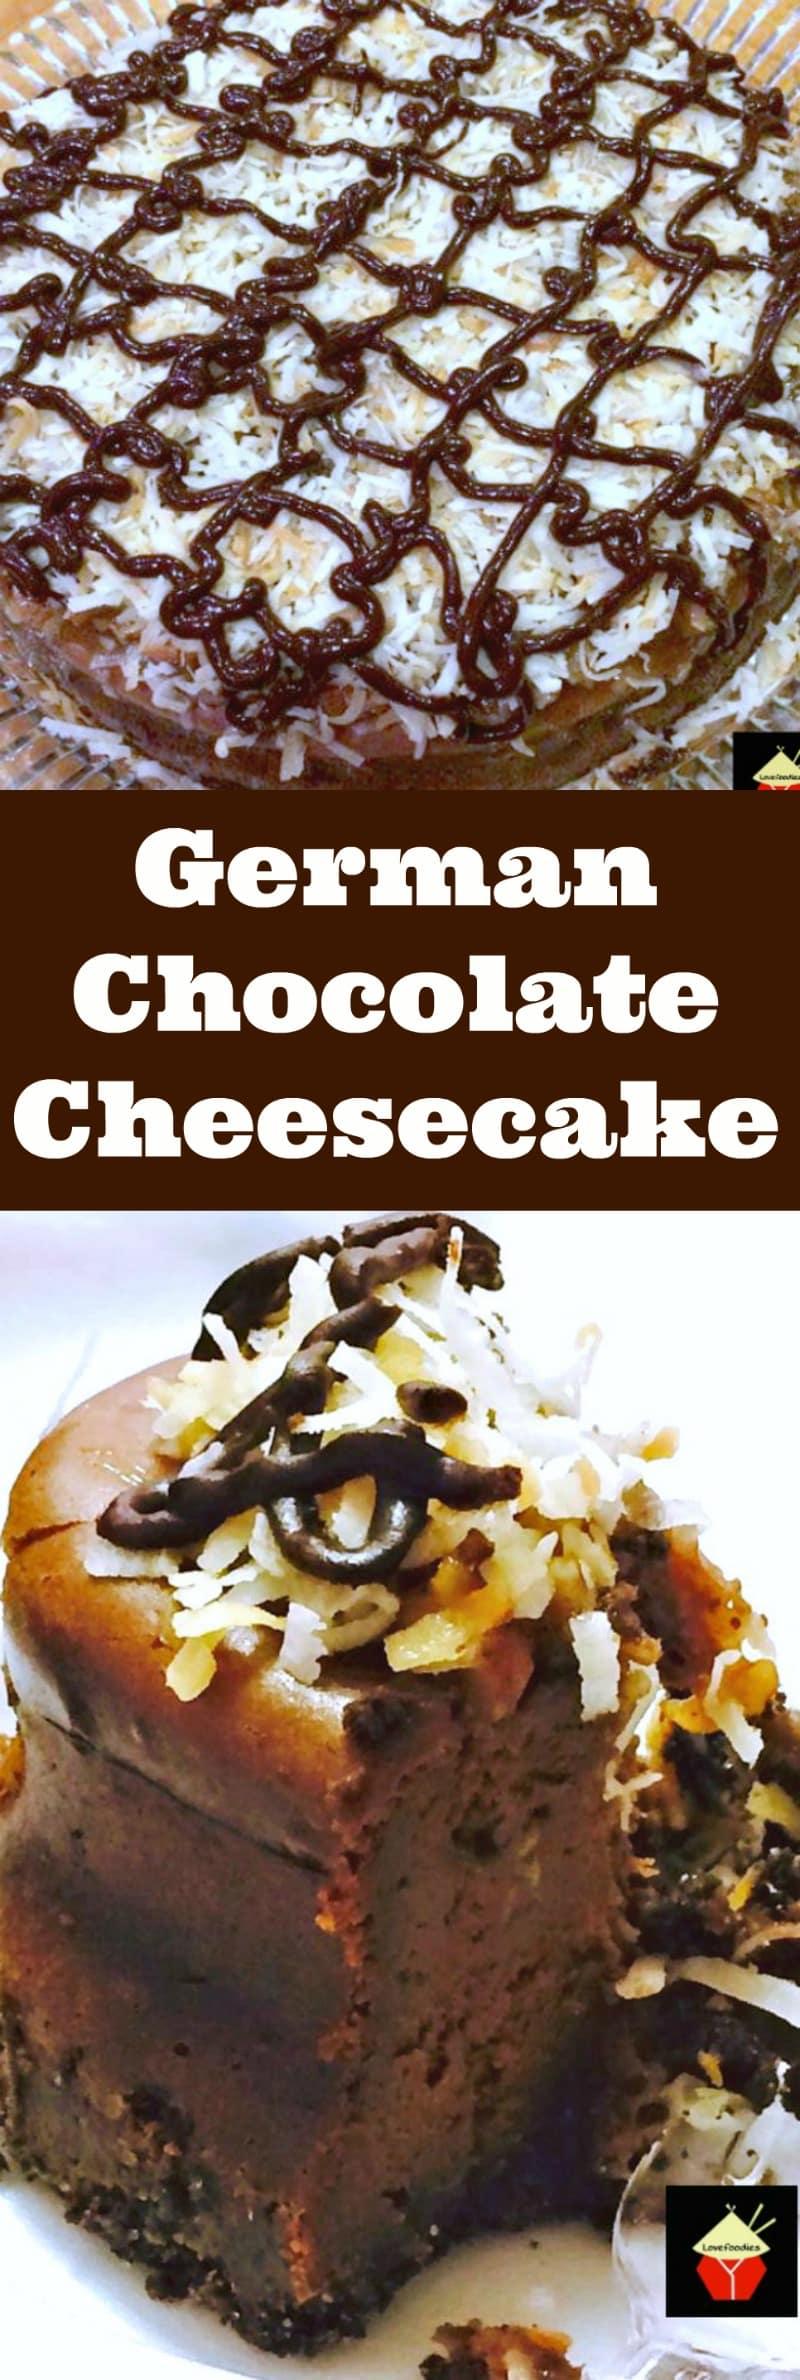 German Chocolate Cheesecake – Lovefoodies